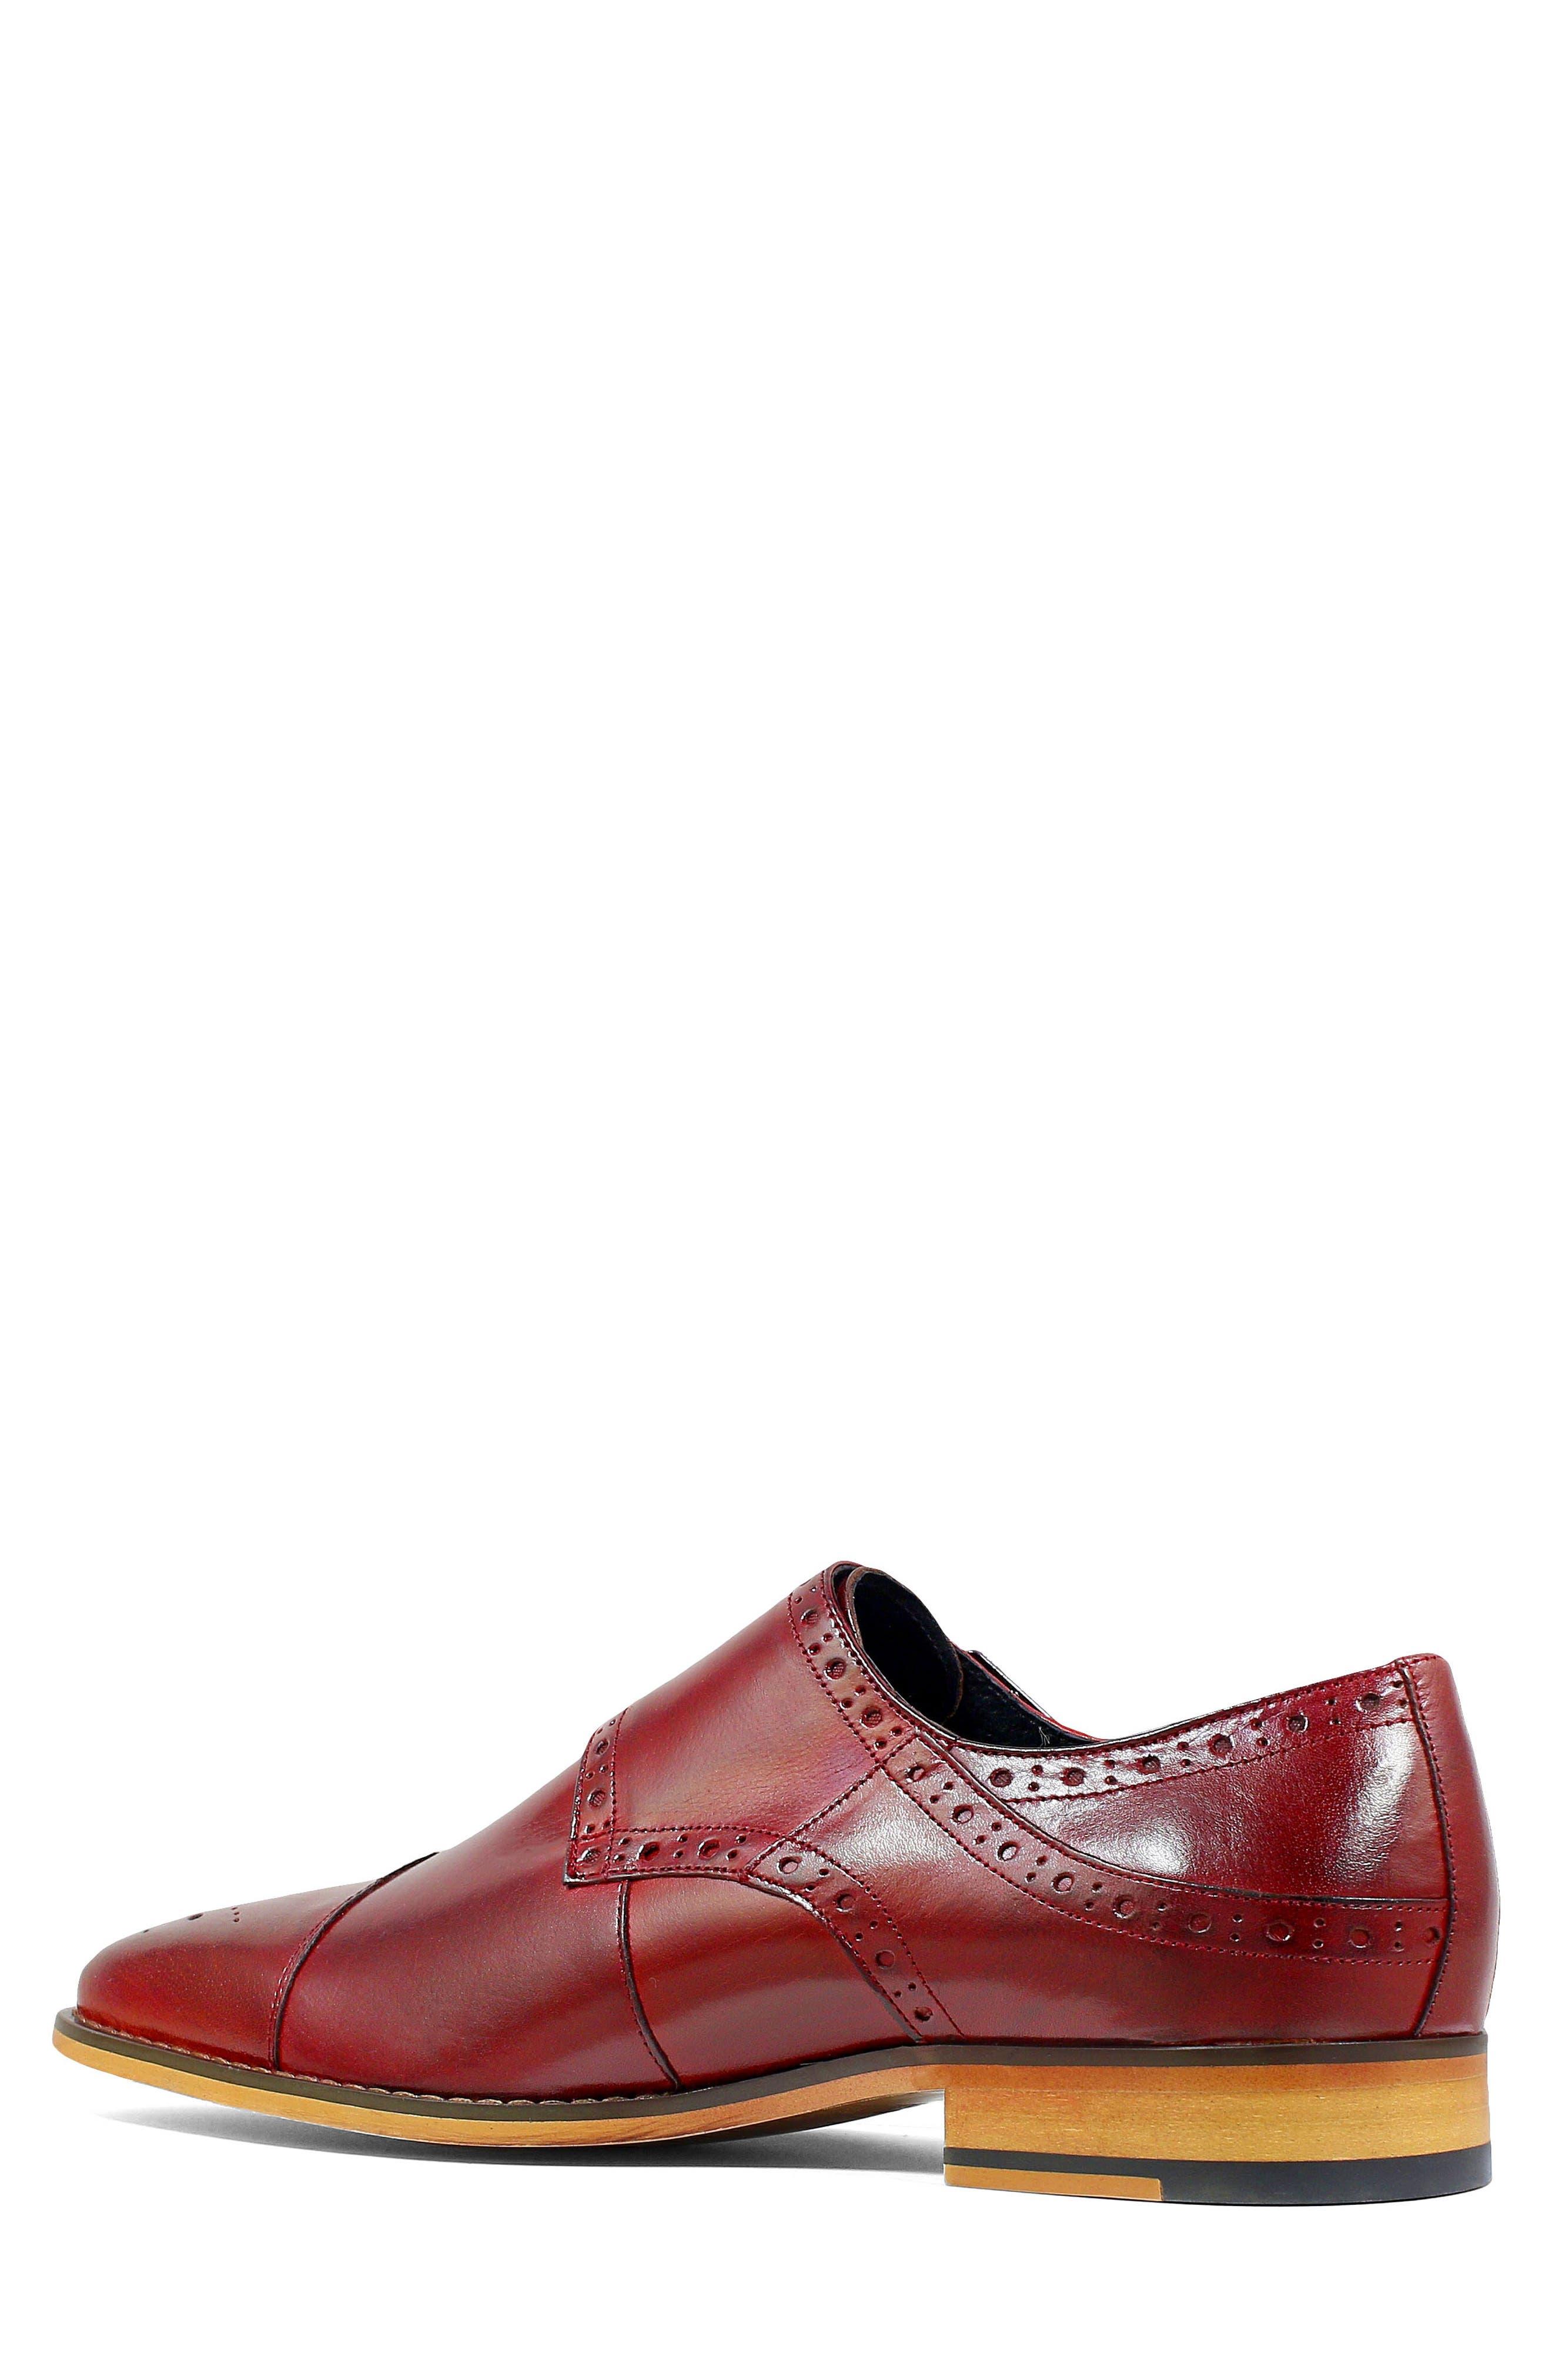 Tayton Cap Toe Double Strap Monk Shoe,                             Alternate thumbnail 2, color,                             RED LEATHER